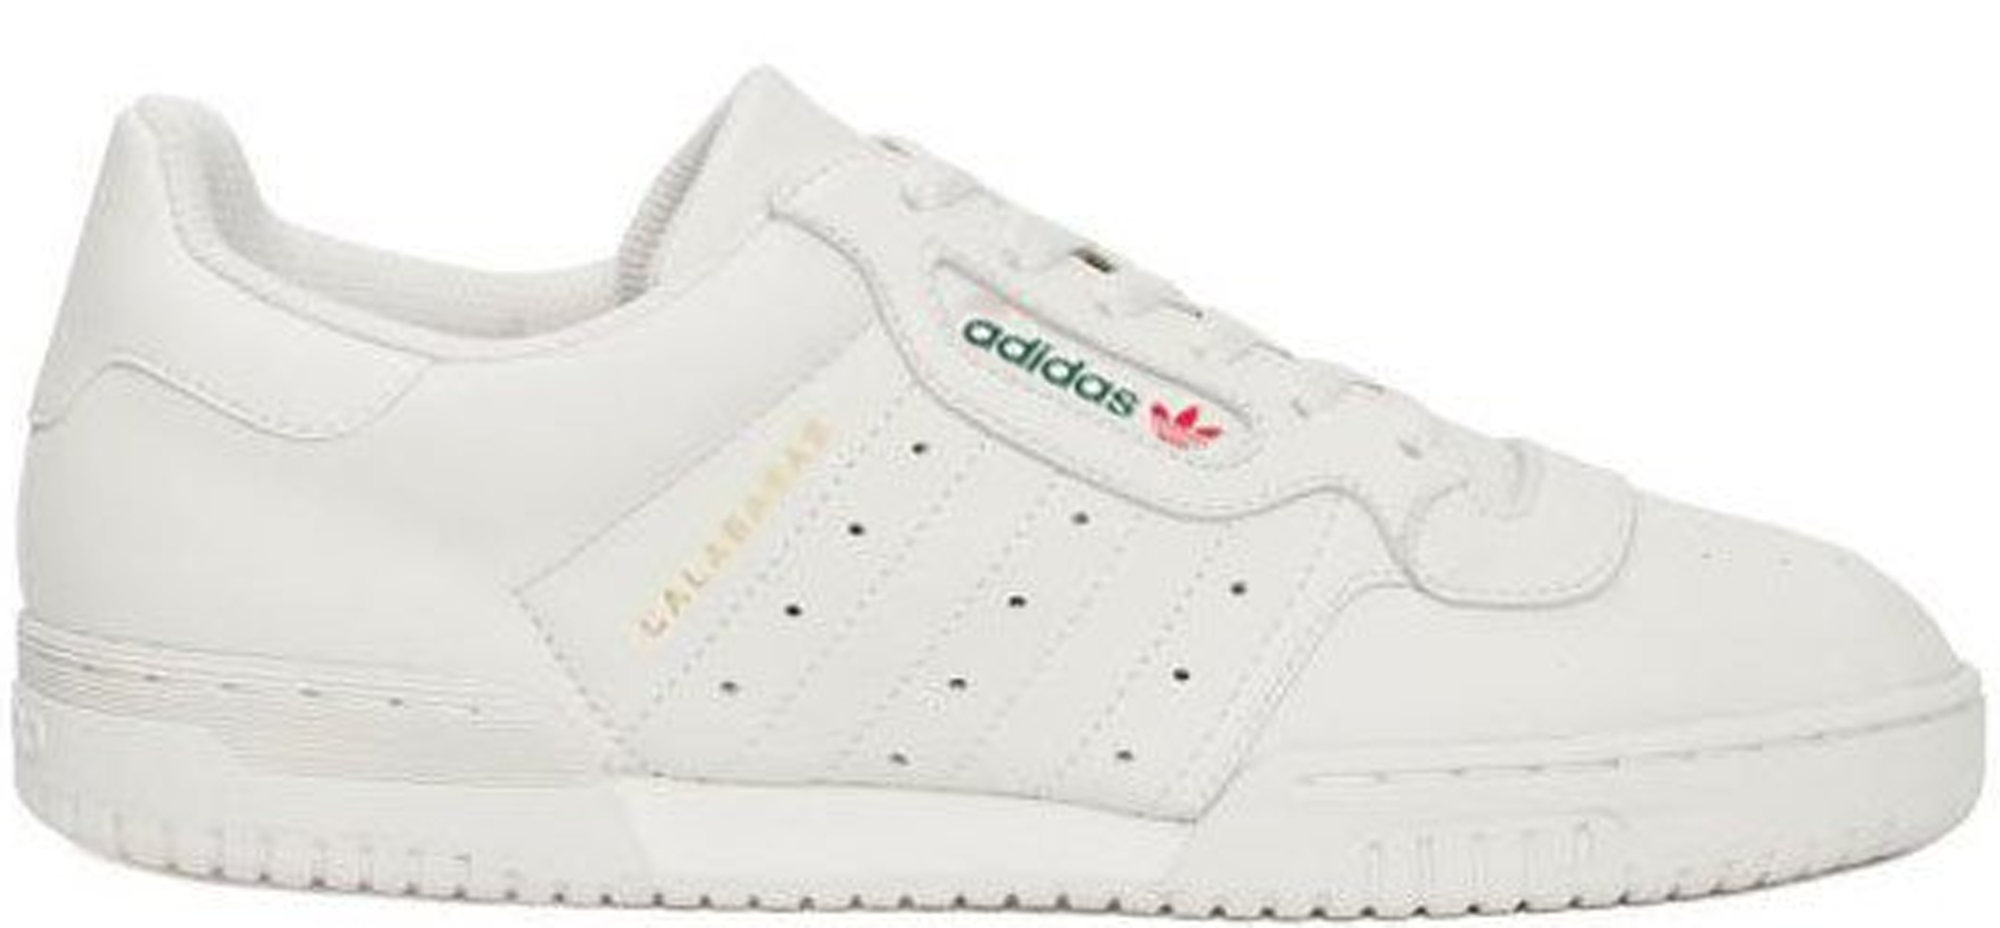 adidas calabasas powerphase white cheap